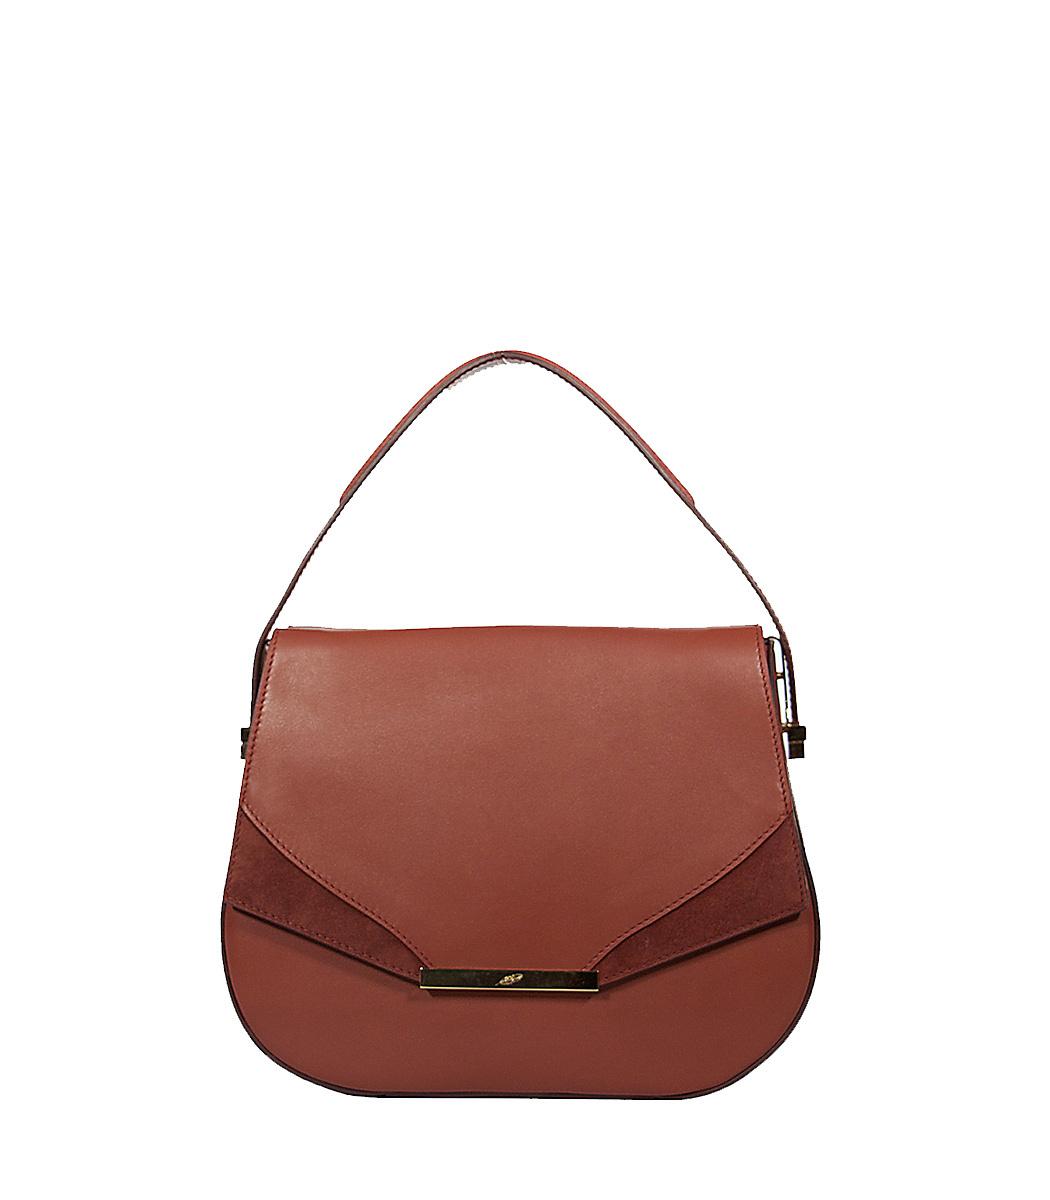 Saddle DeeDee Saddle Bag